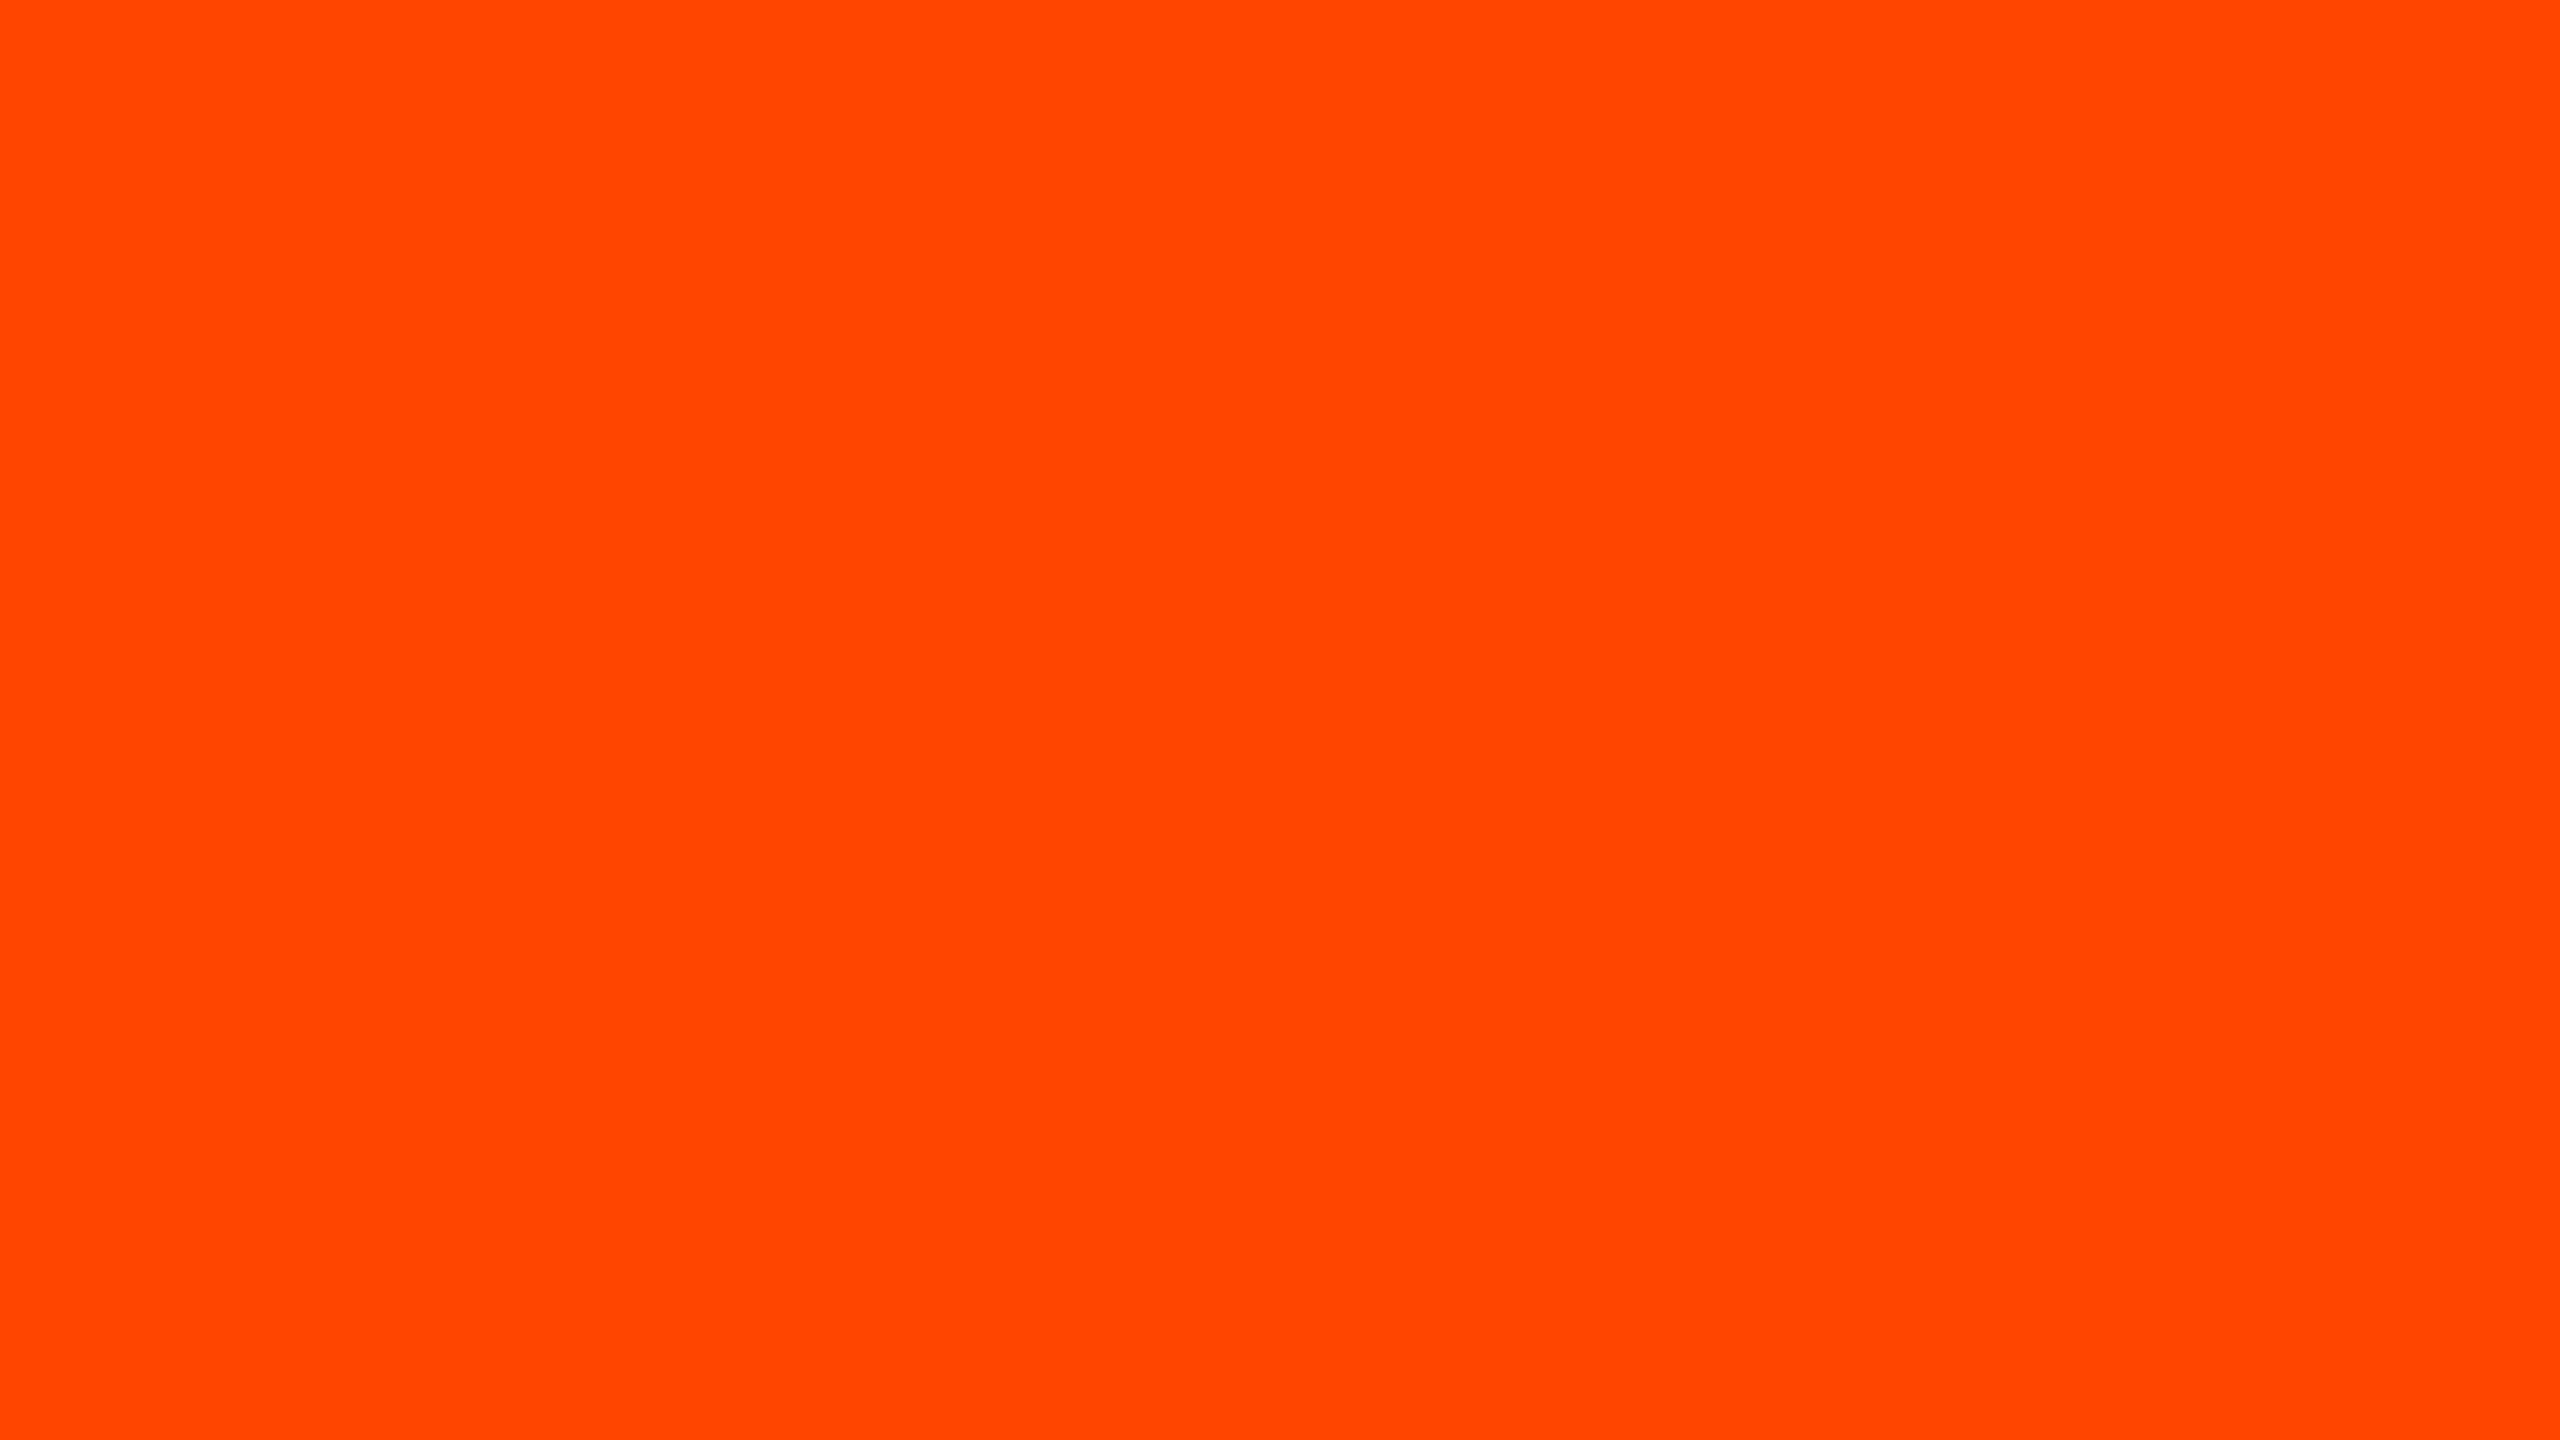 2560x1440 Orange-red Solid Color Background